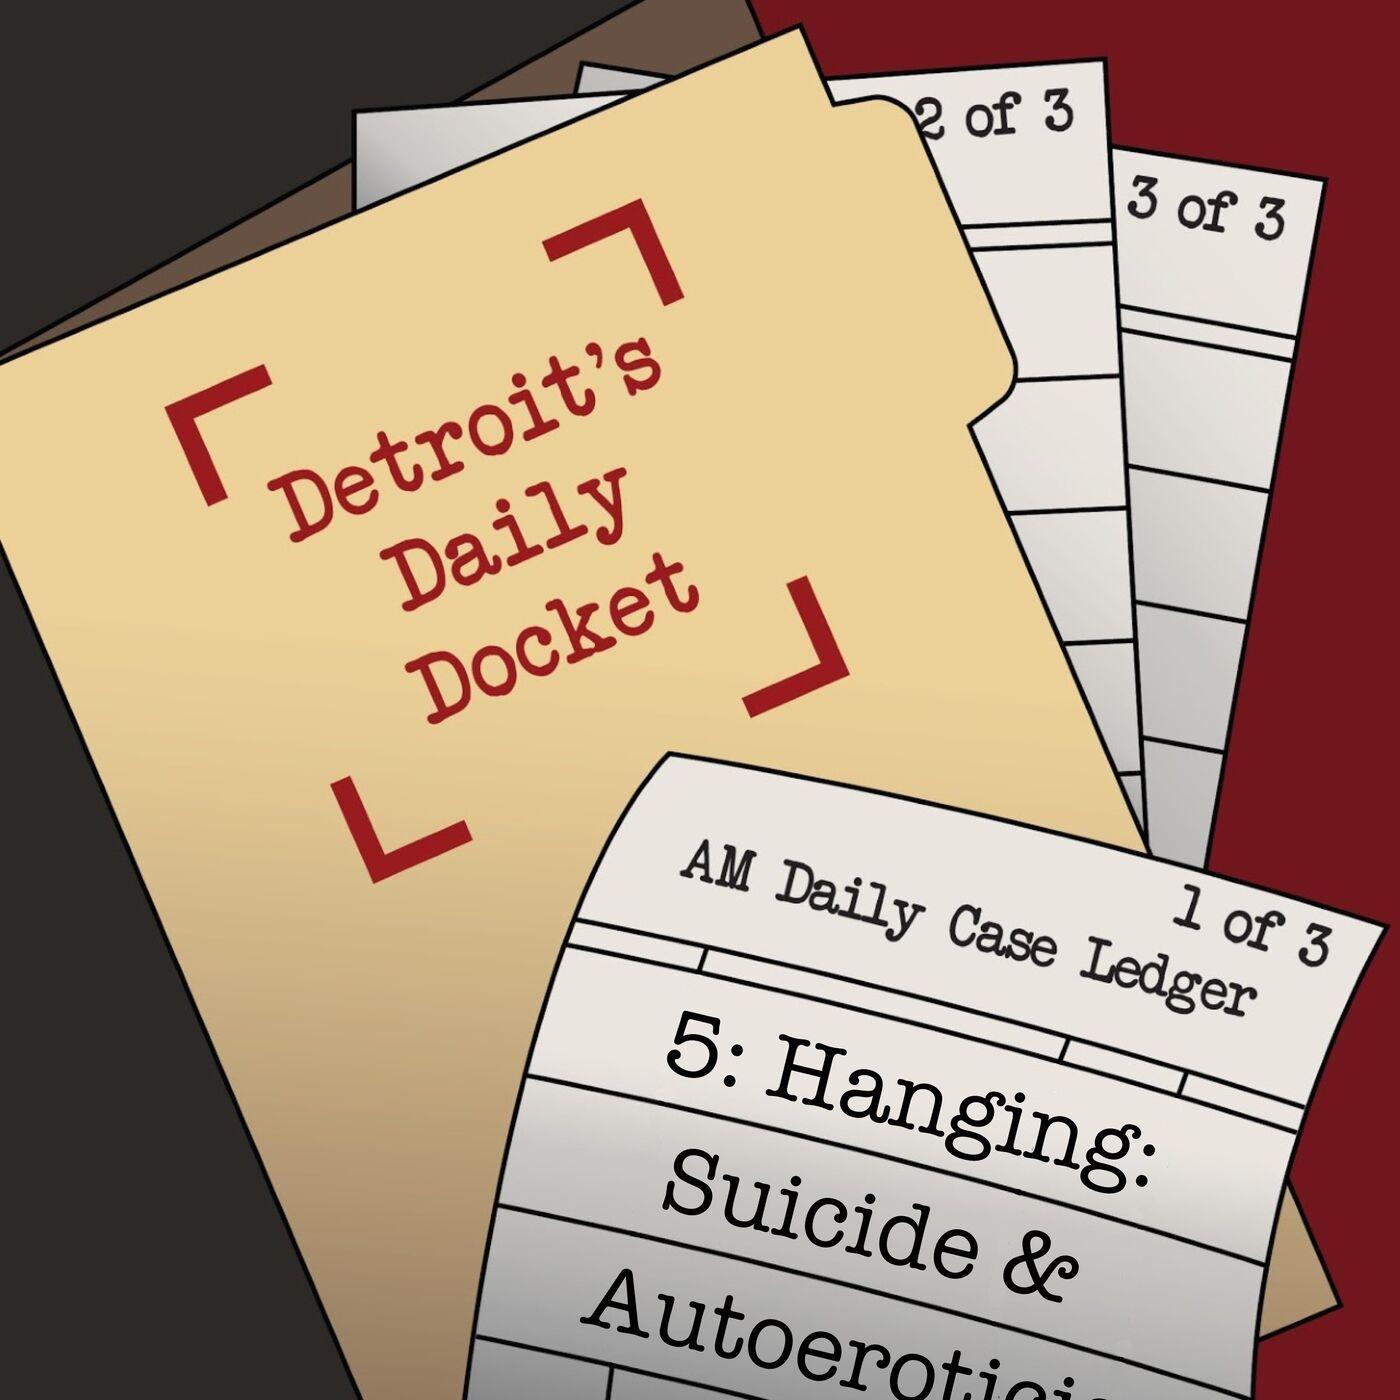 Hanging:  Suicide & Autoeroticism